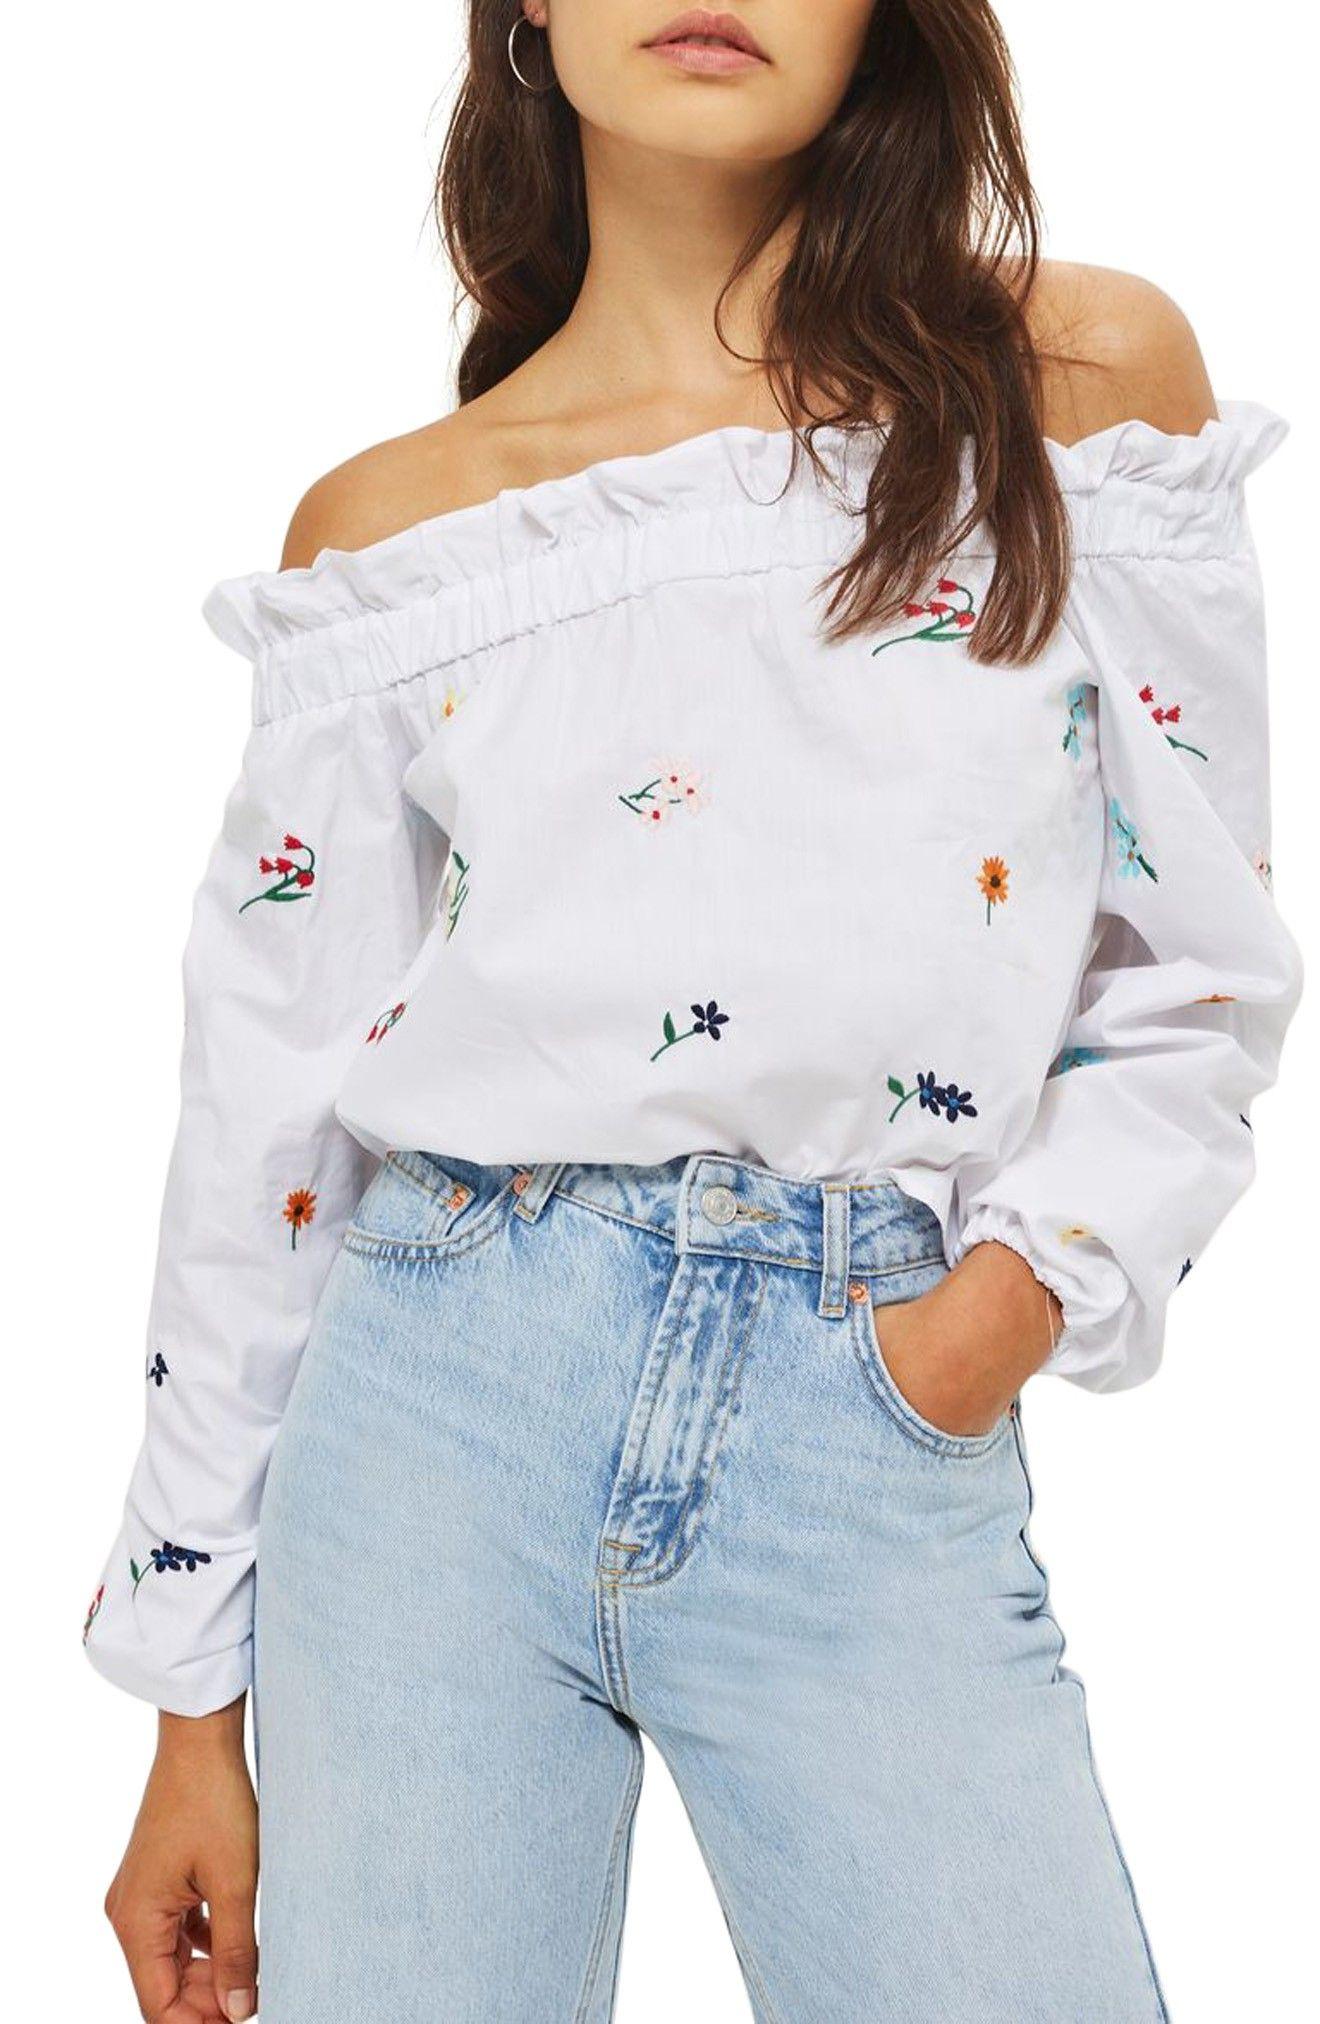 d7de716a19e05 topshop floral embroidered off the shoulder top